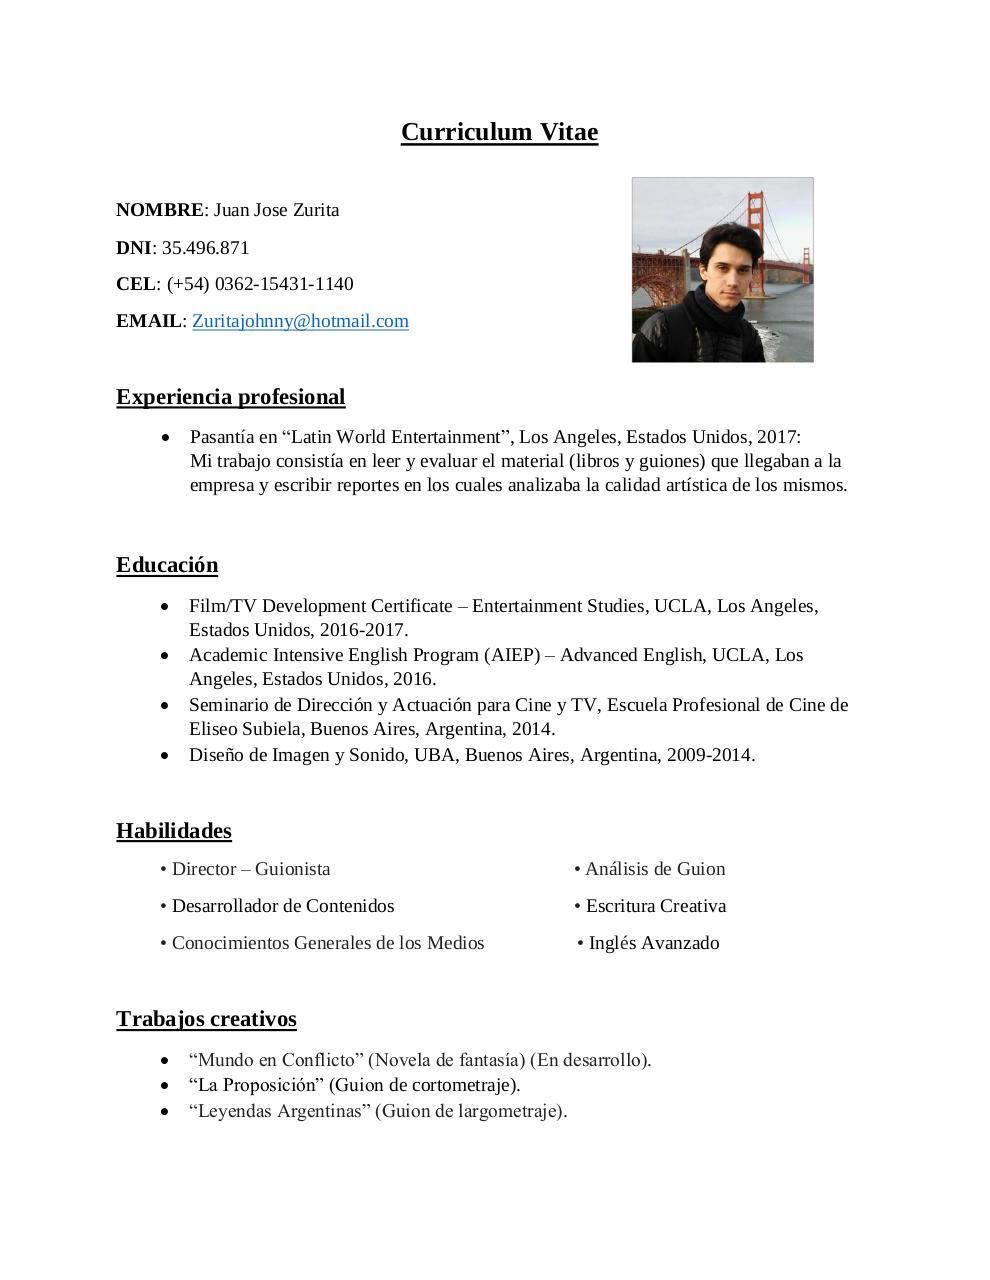 Cv Juan Jose Zurita By Johnny Zurita Pdf Archive